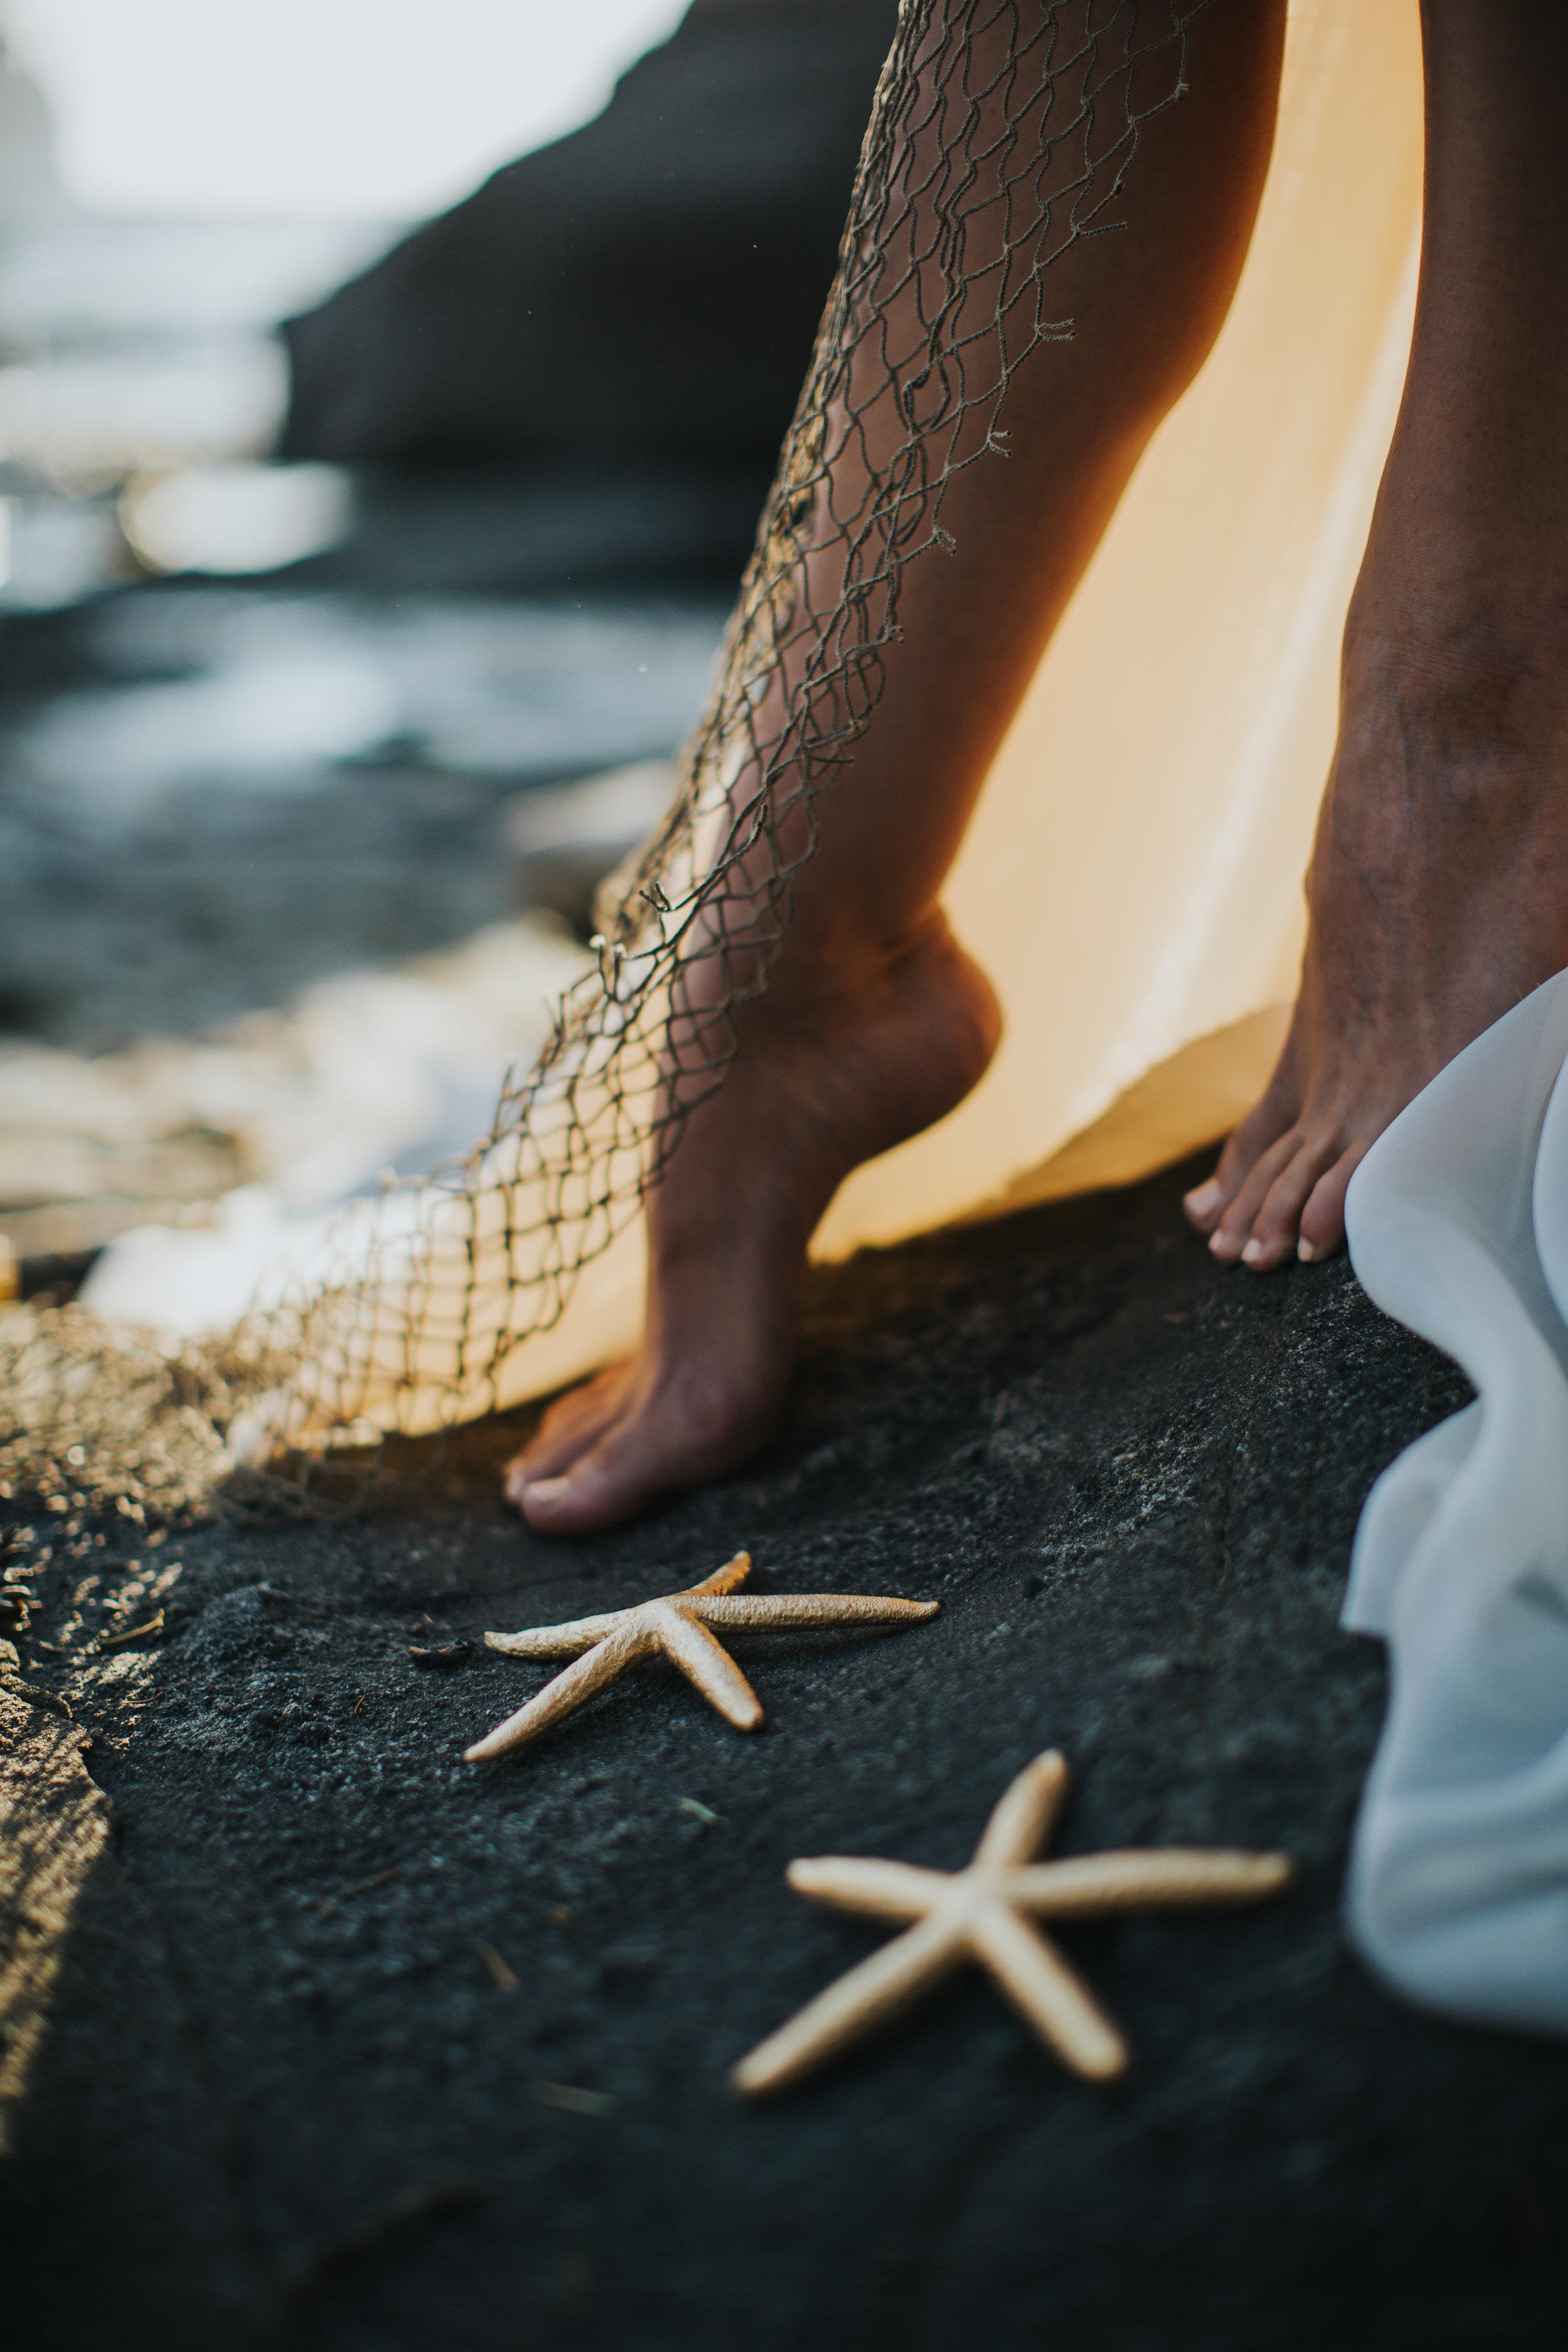 Port-Angeles-Salt-Creek-beach-wedding-bride-PNW-olympic-peninsula-photographer-Kayla-Dawn-Photography-outdoors-golden-hour-dancer-dress (32).jpg